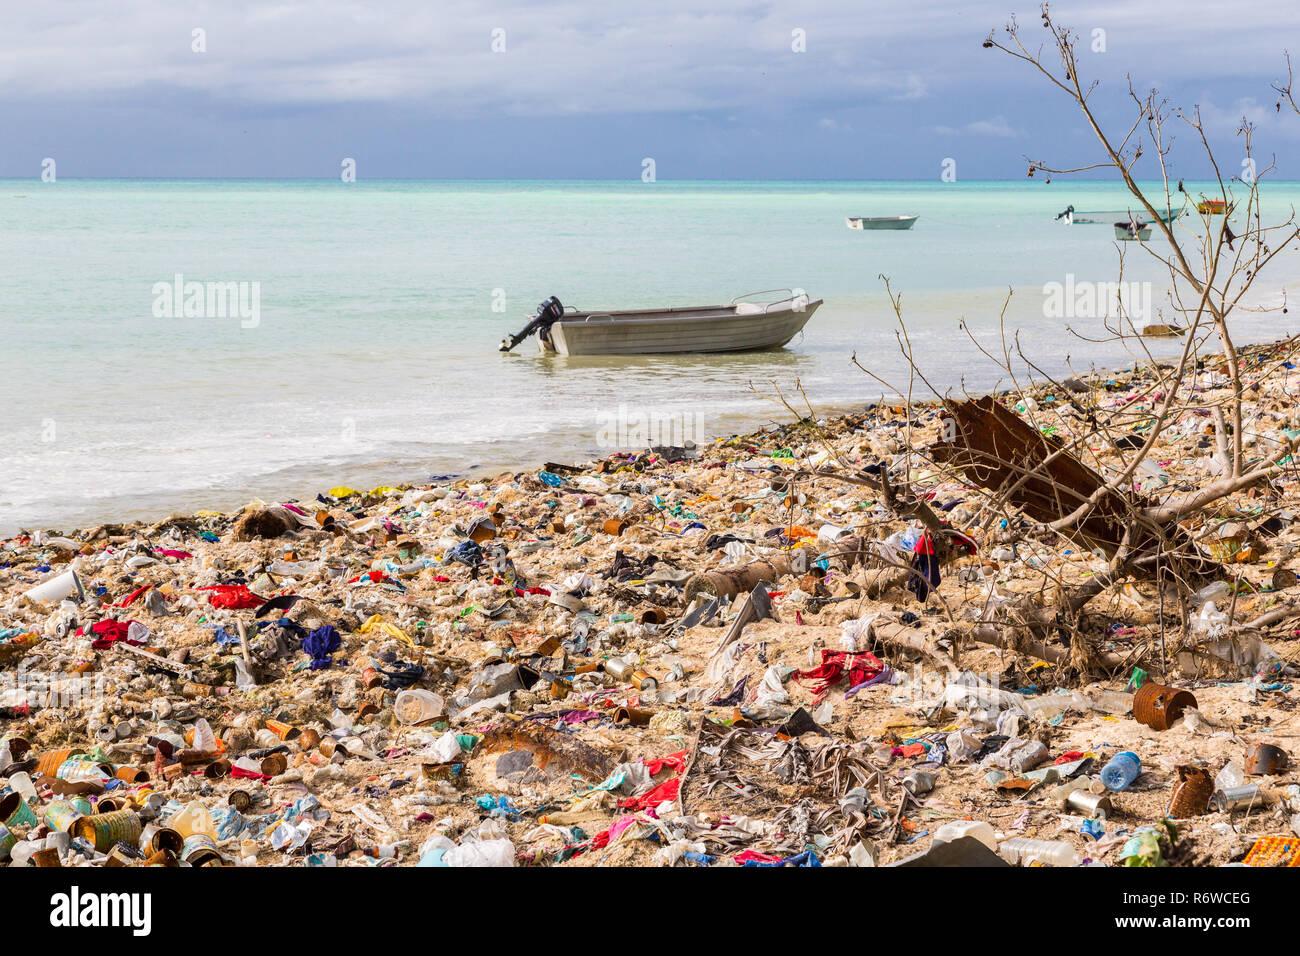 Garbage dump, landfill on Micronesian atoll sandy beach, South Tarawa, Kiribati, Oceania, South Pacific Ocean. Ecological, warming, garbage problems. - Stock Image